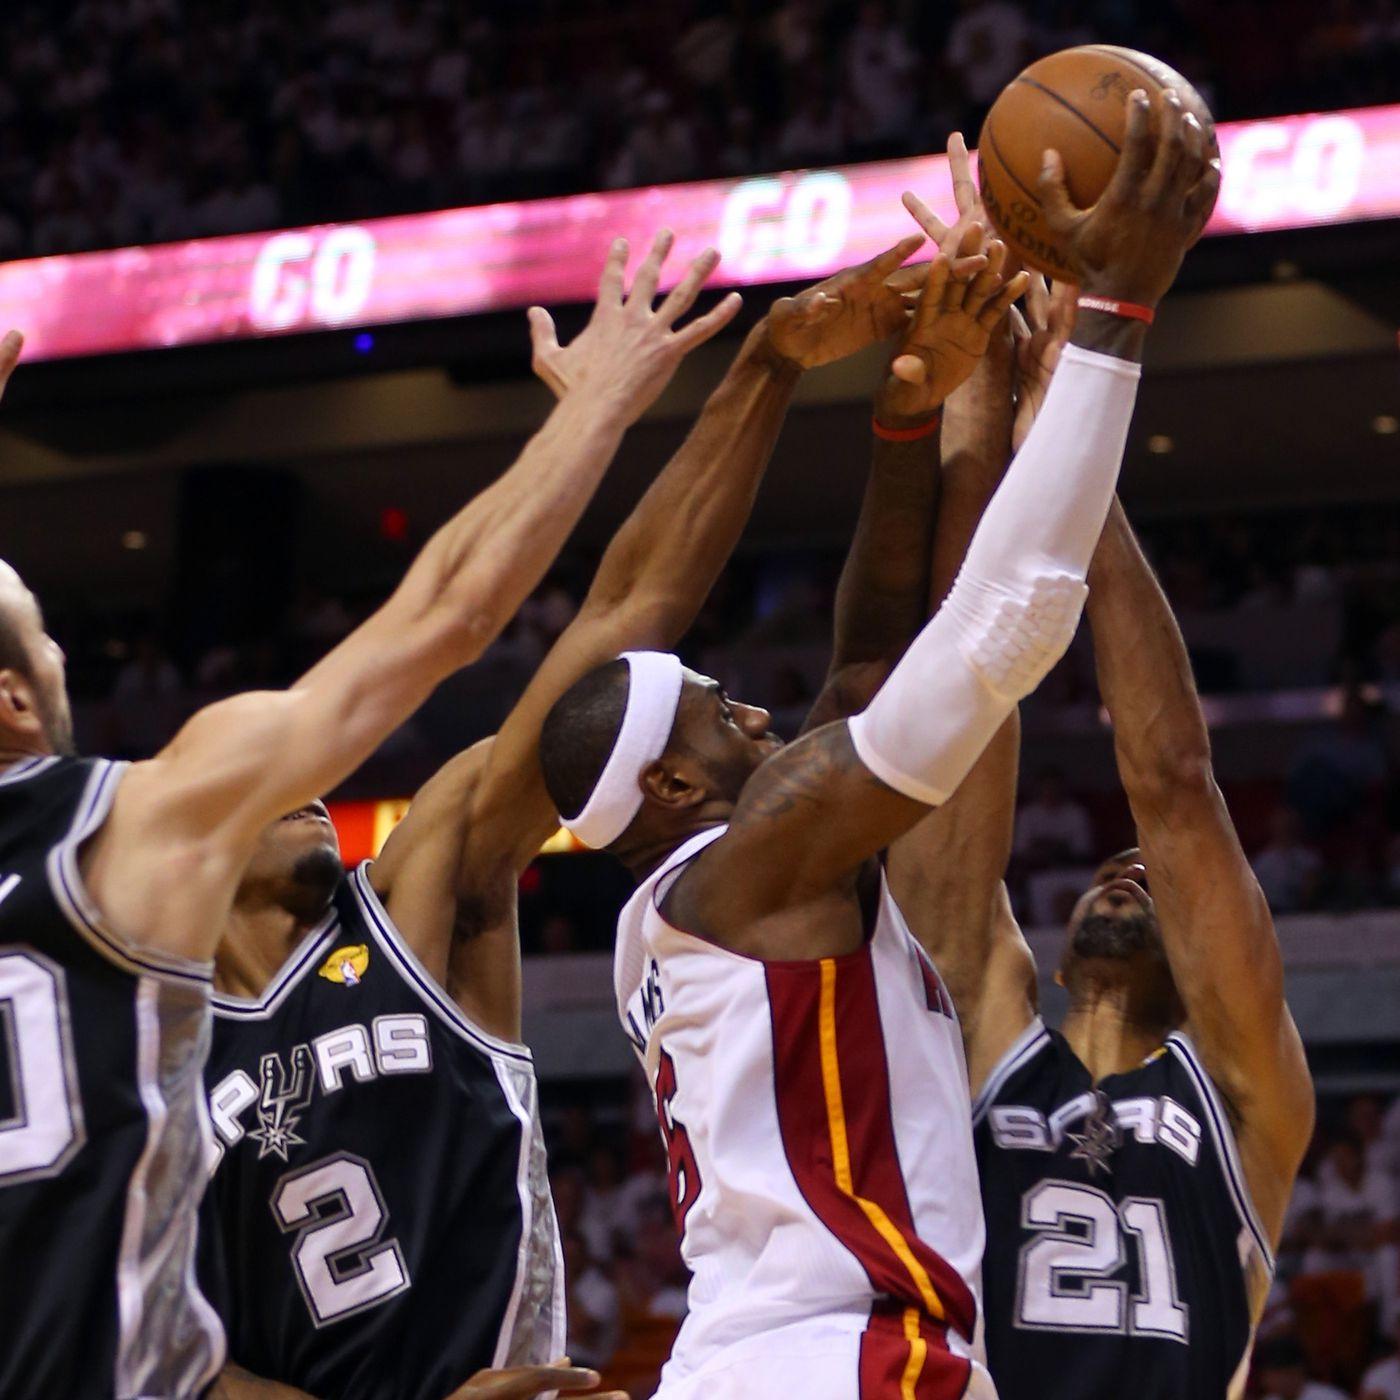 Nba Finals 2013 Spurs Vs Heat Game 6 Miami Caps Wild Ot Finish With 103 100 Win Sbnation Com